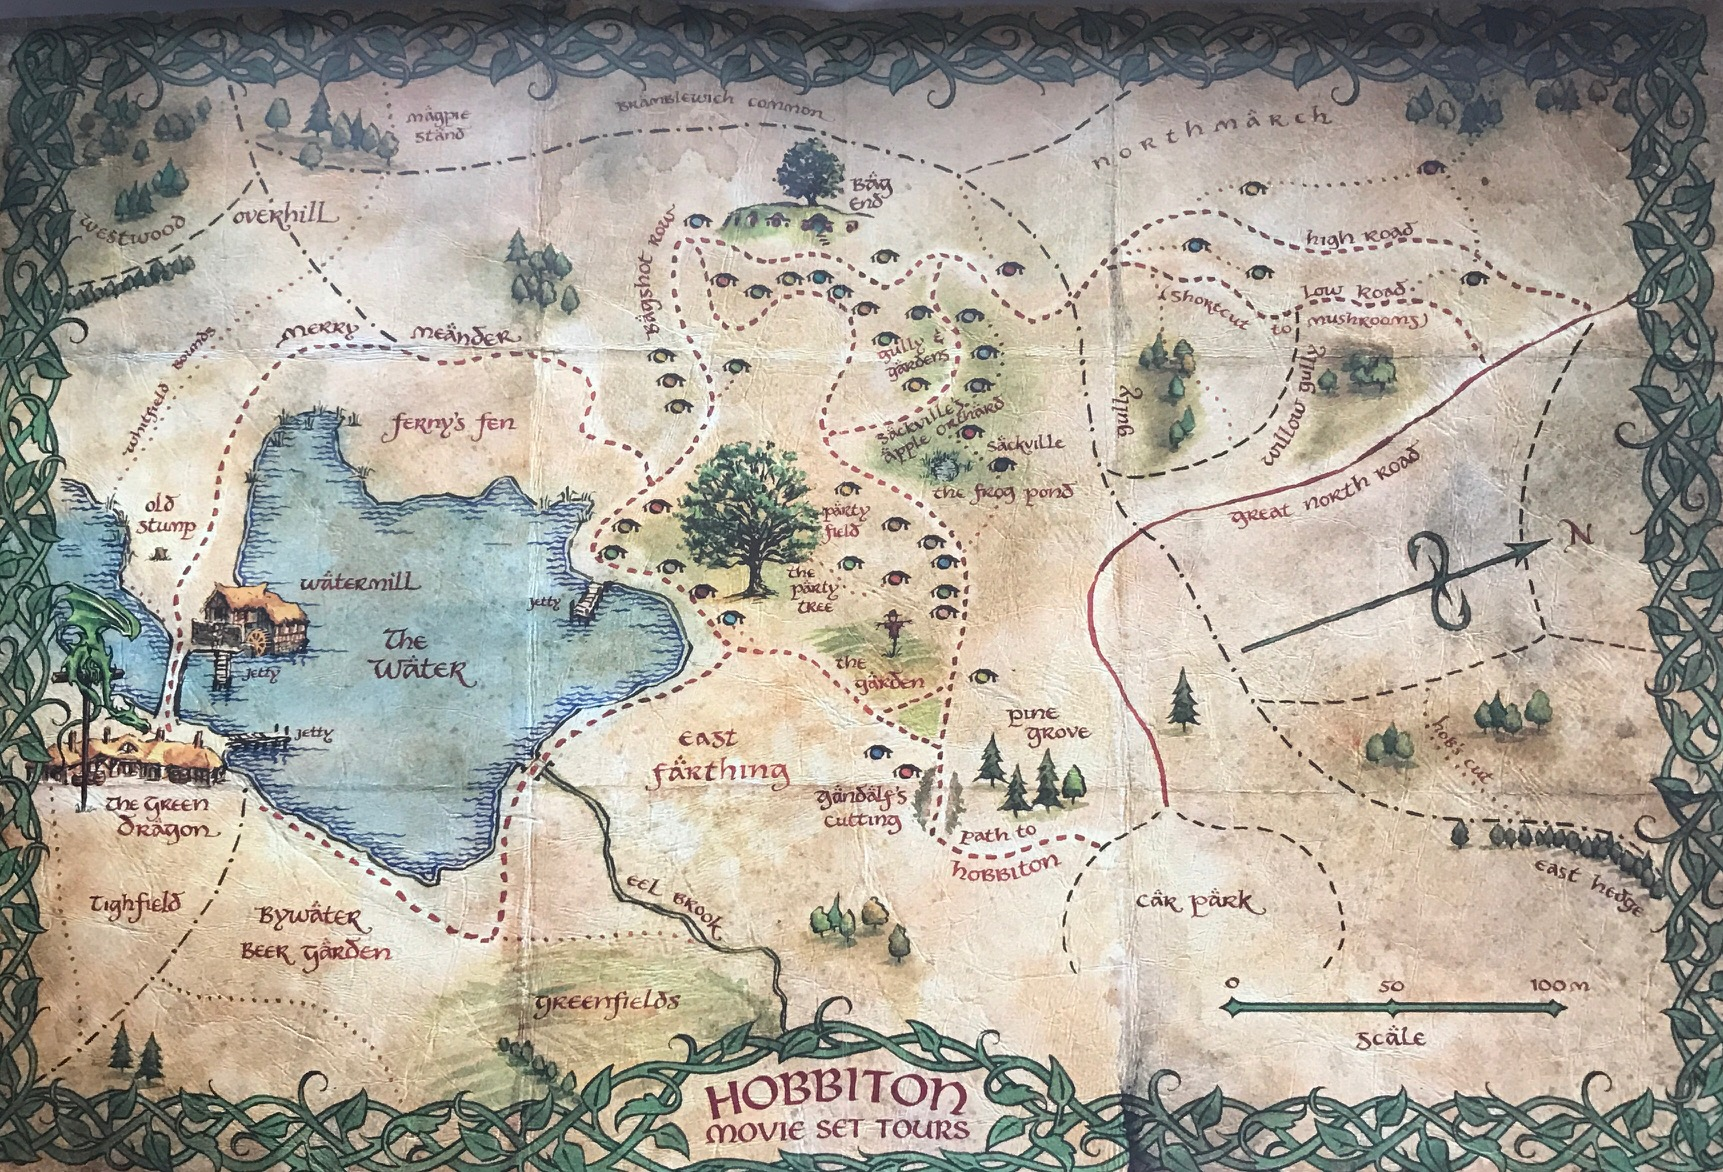 Hobbiton Movie Set Map